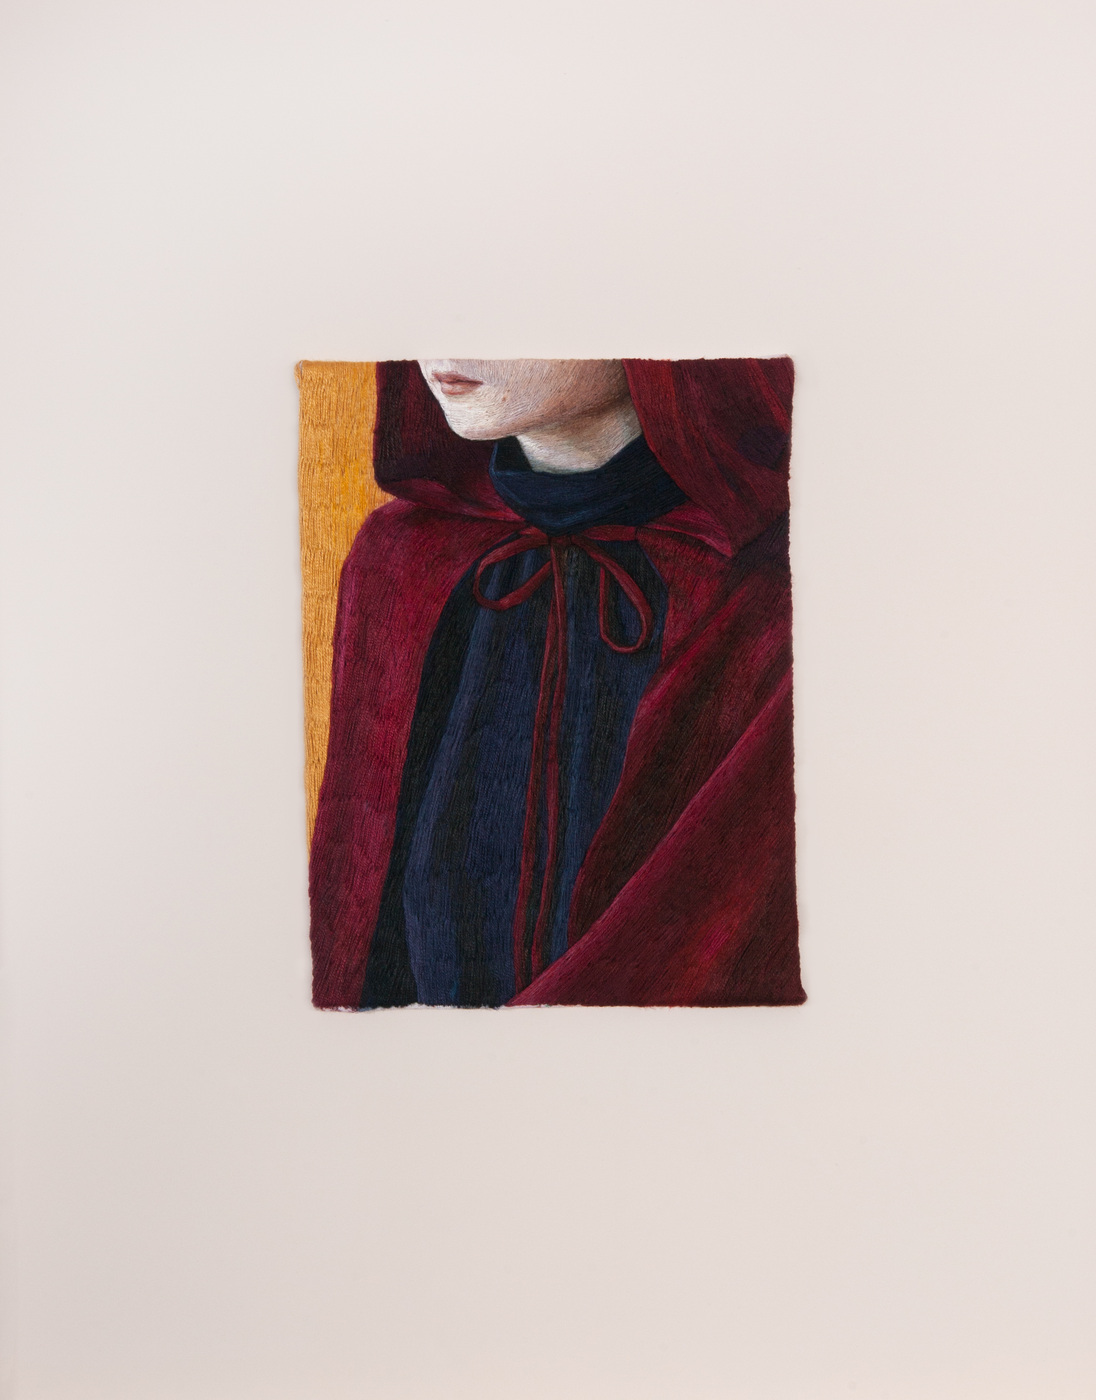 6.handmade embroidery